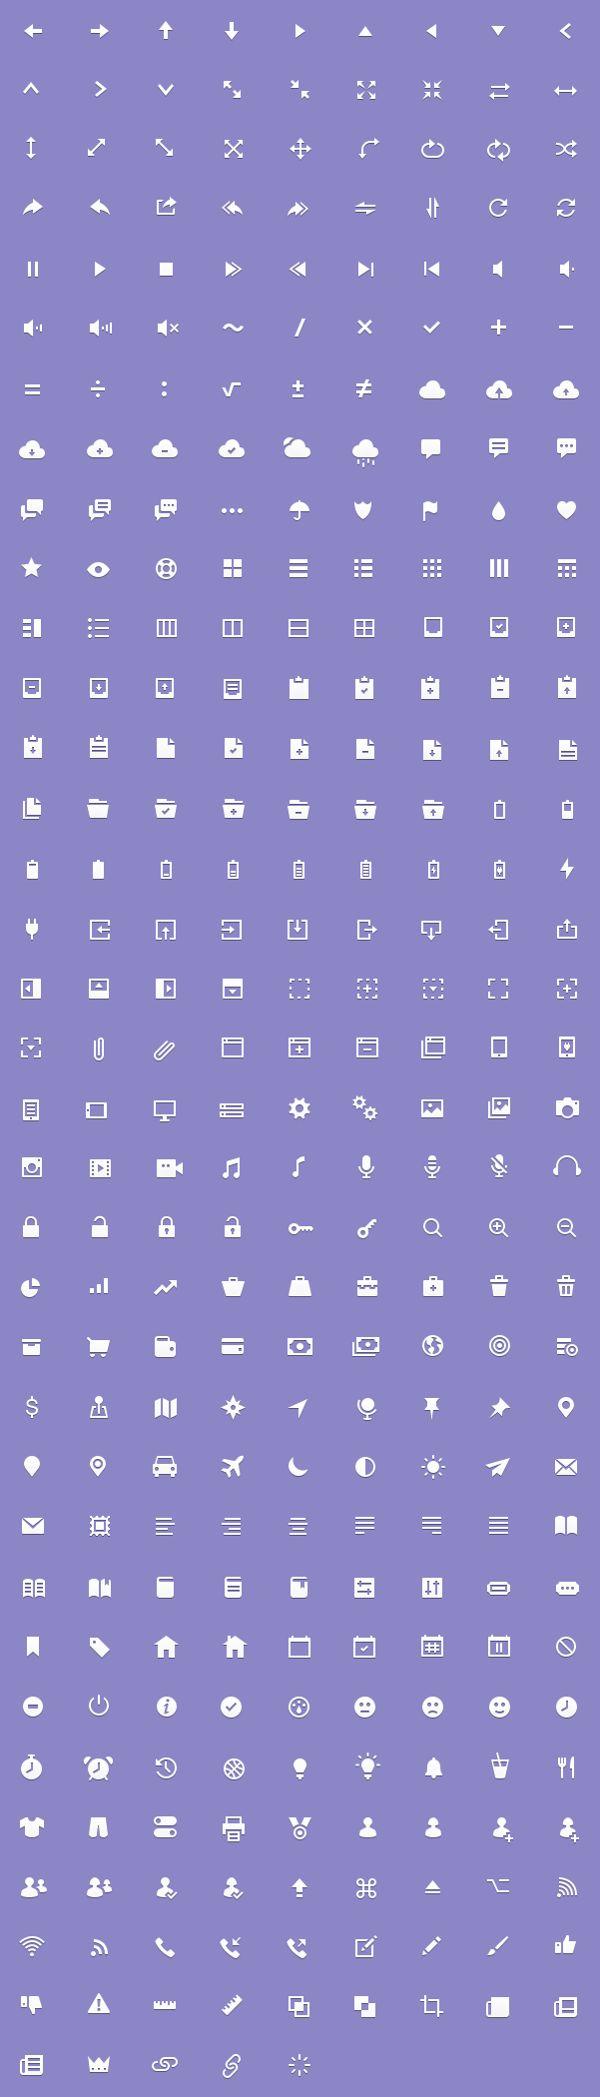 Prototicons by Adam Hayek, via Behance - $15